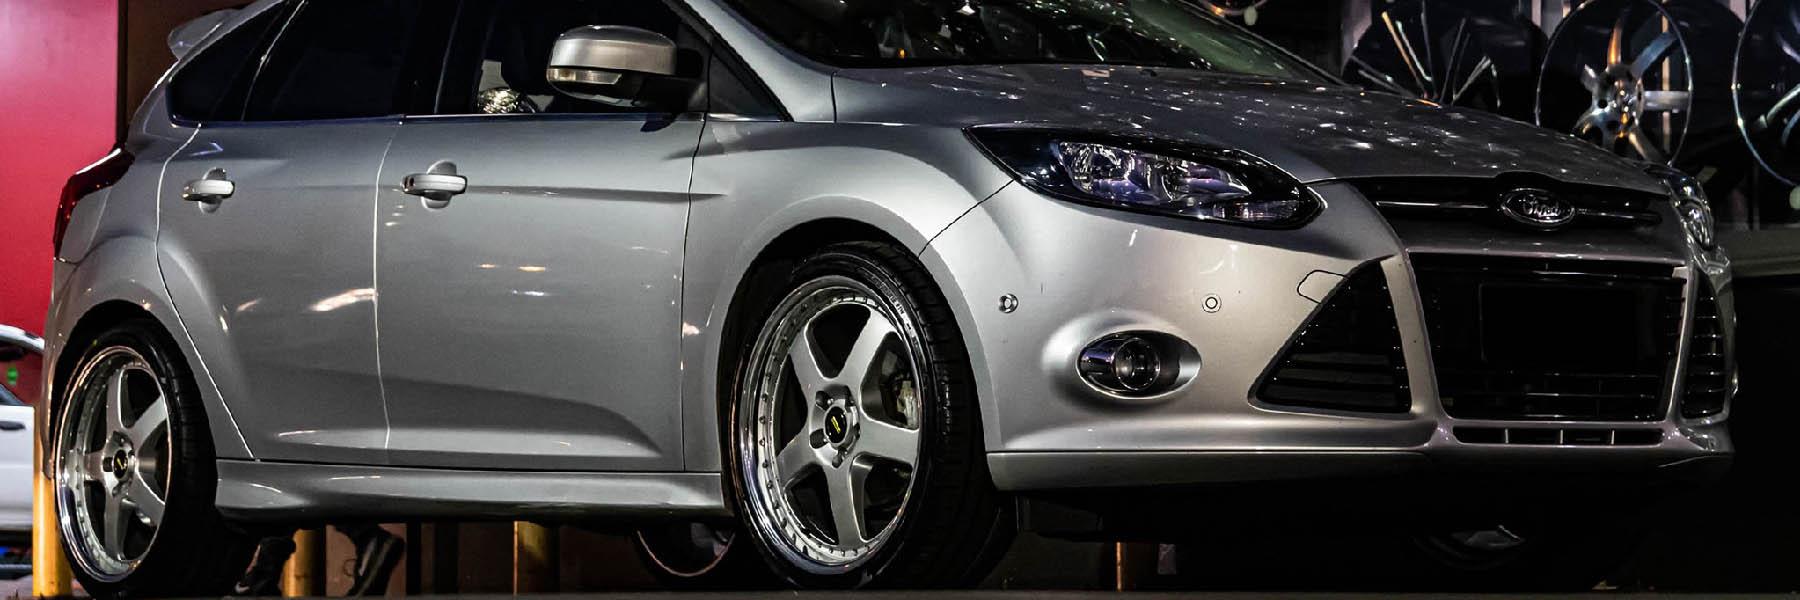 5x115 wheels rims